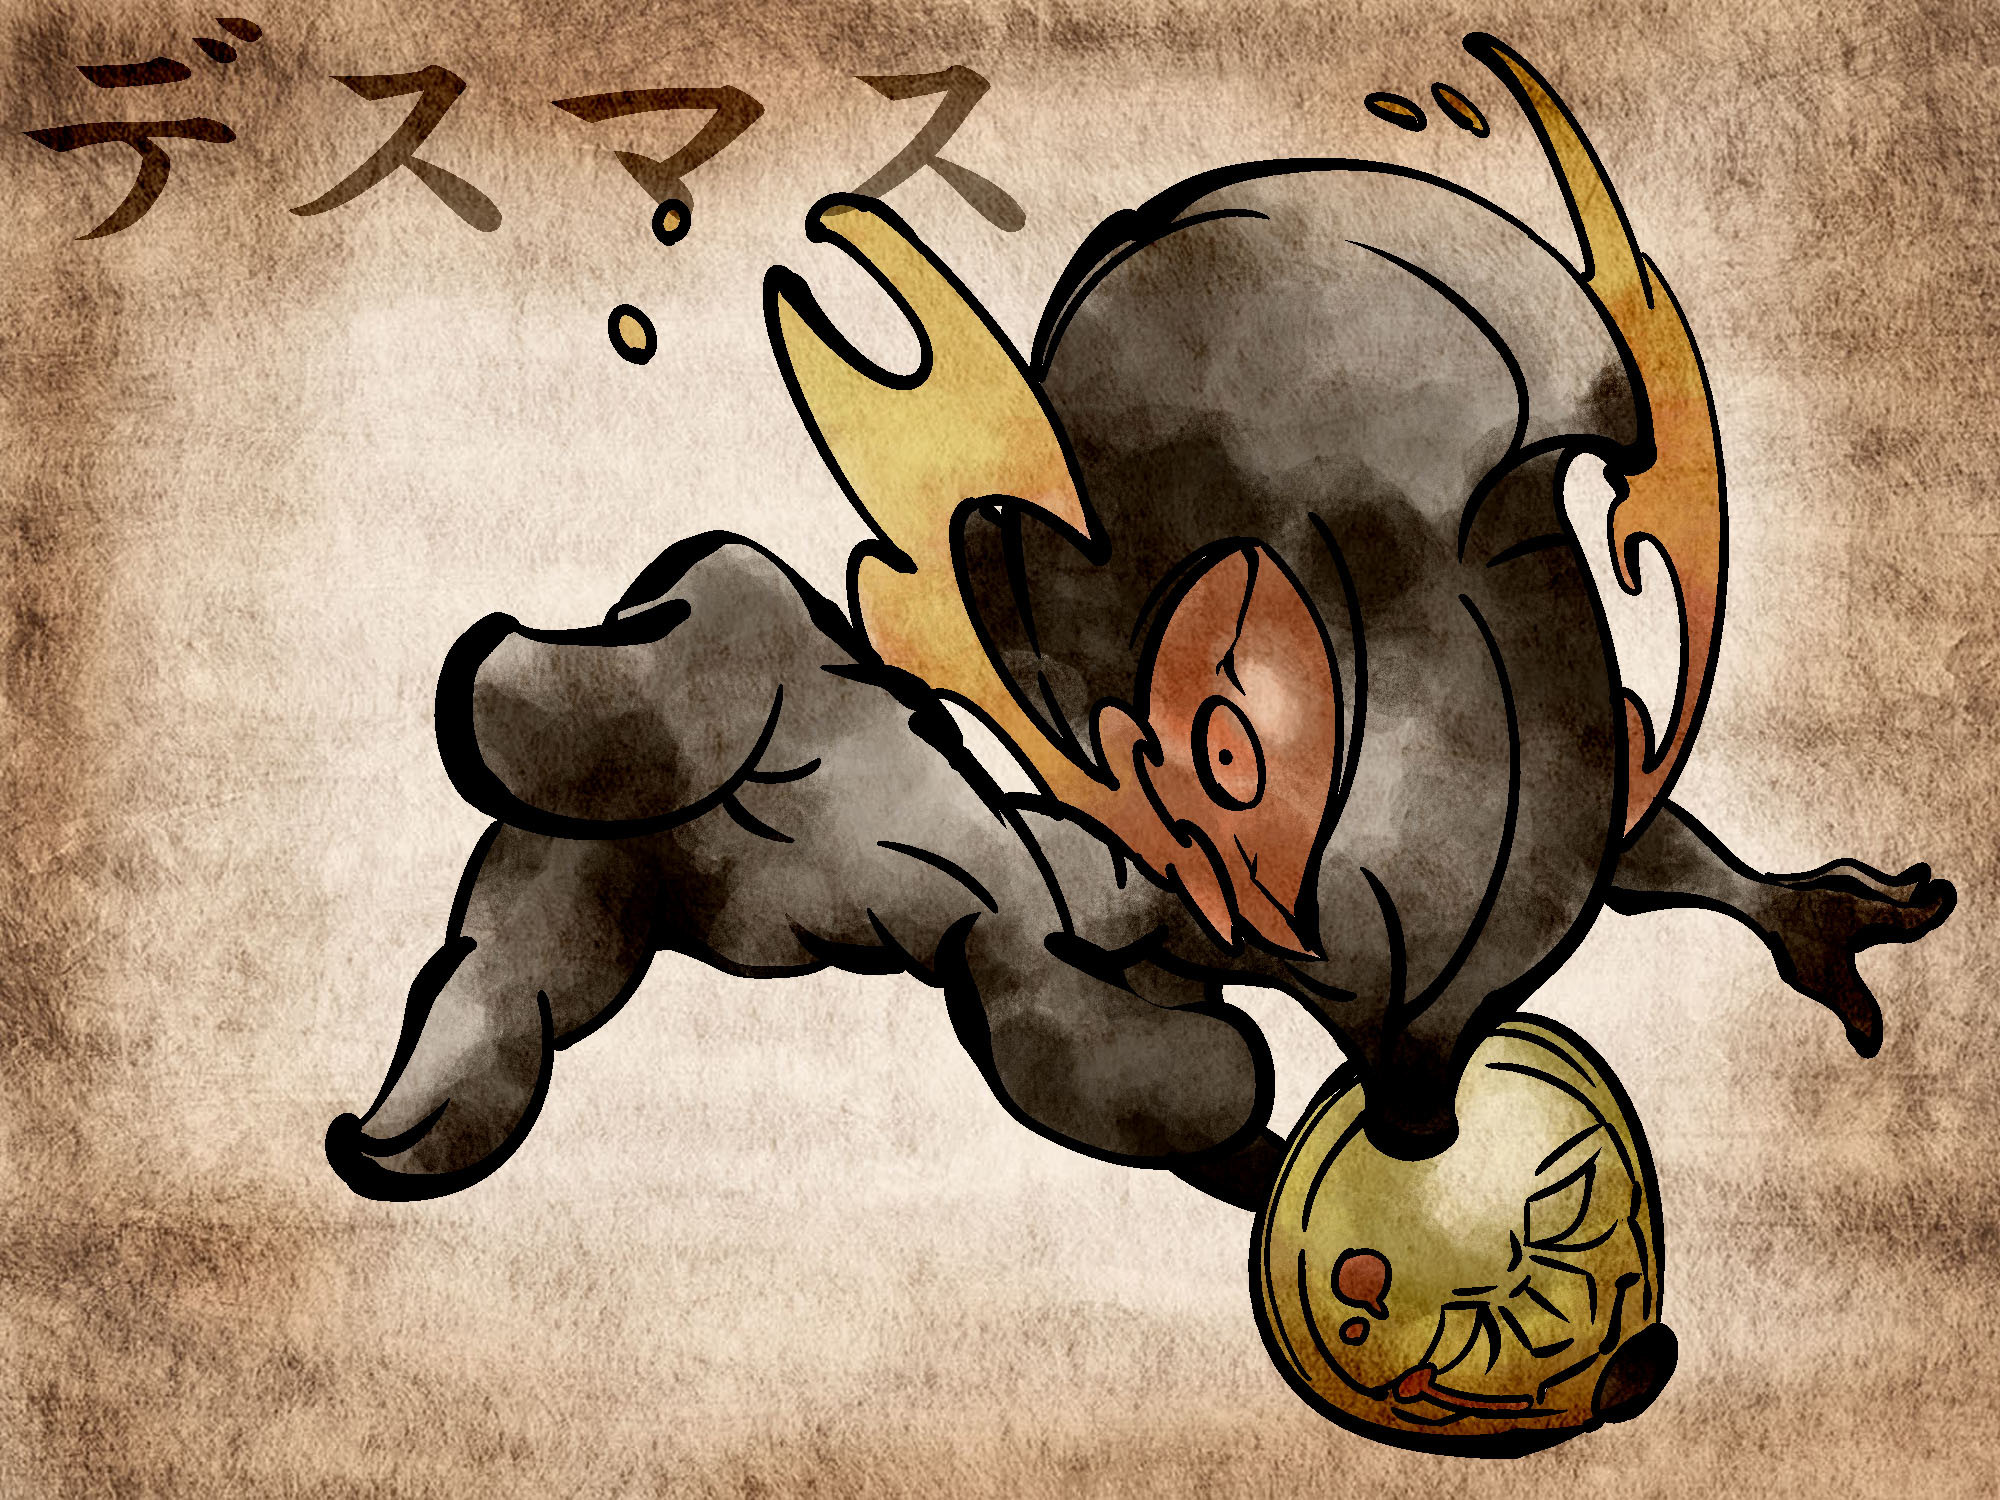 Shiny Cofagrigus Pokemon Images | Pokemon Images